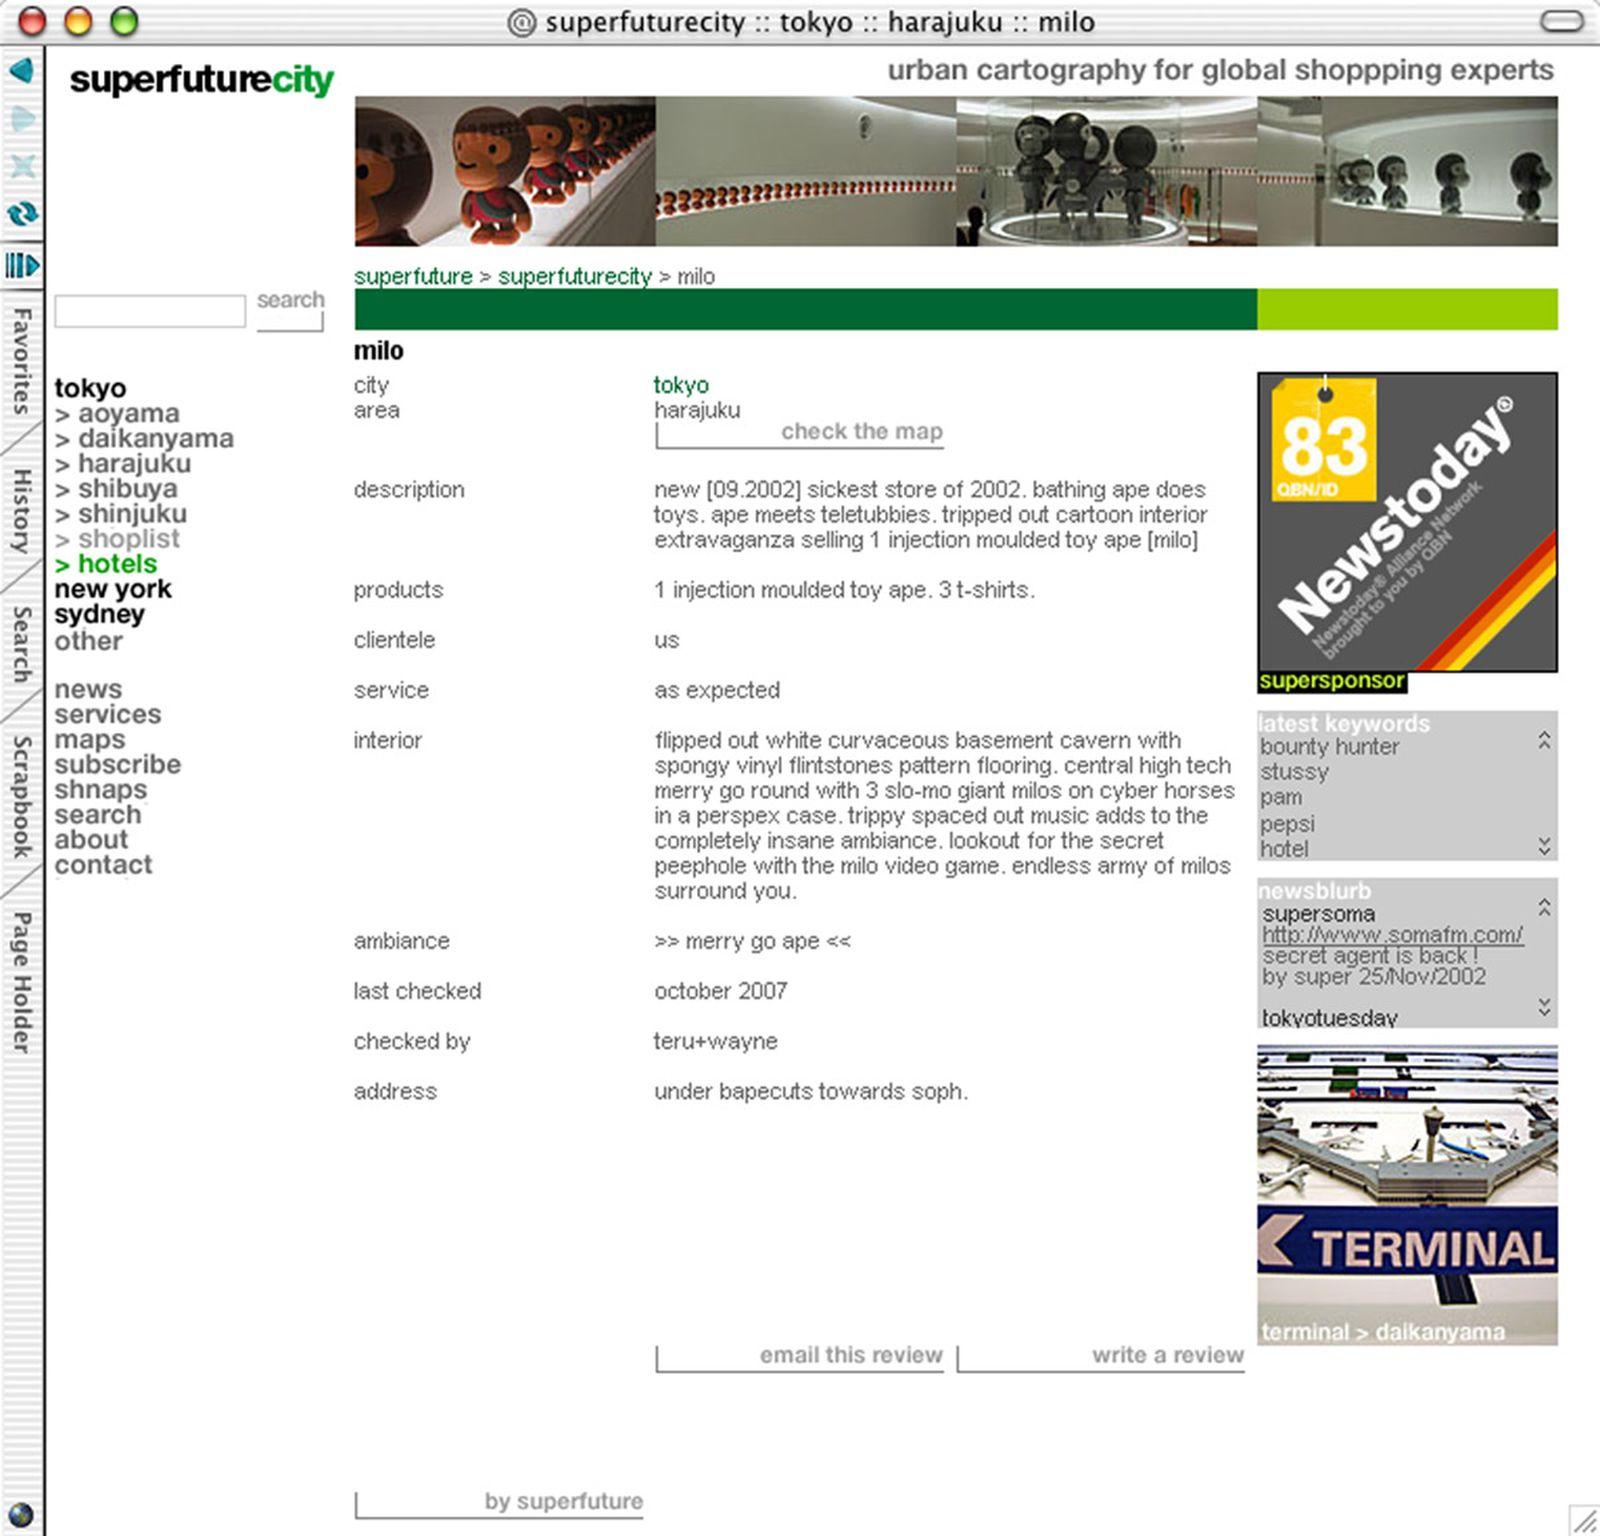 superfuture-secret-internet-diesel-archive-review-2007-tokyo